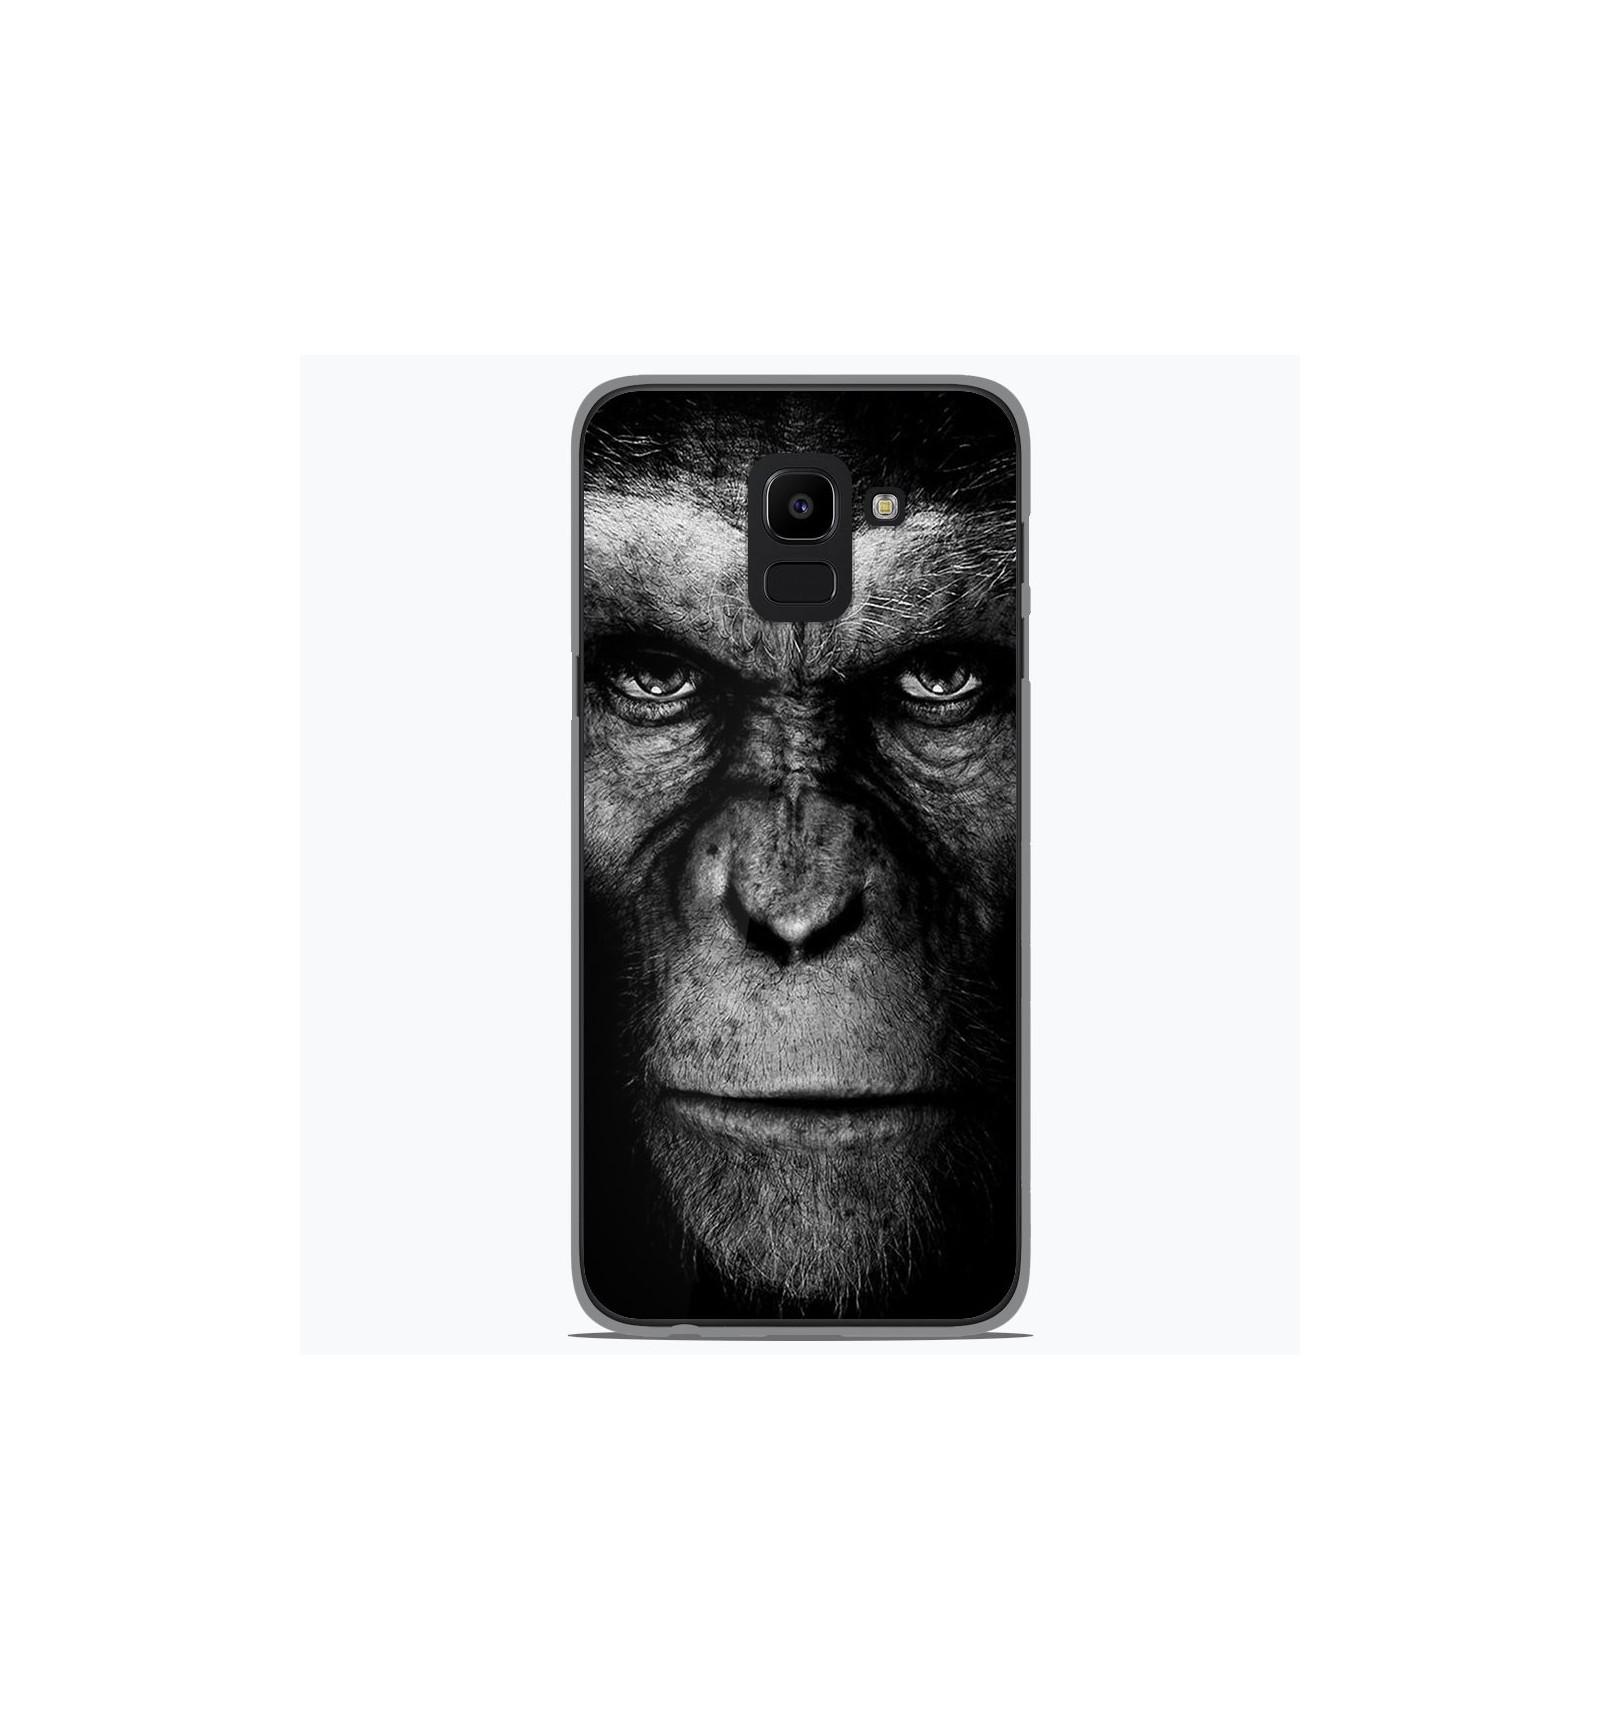 Coque Samsung Galaxy J6 Plus 2018 Captain America